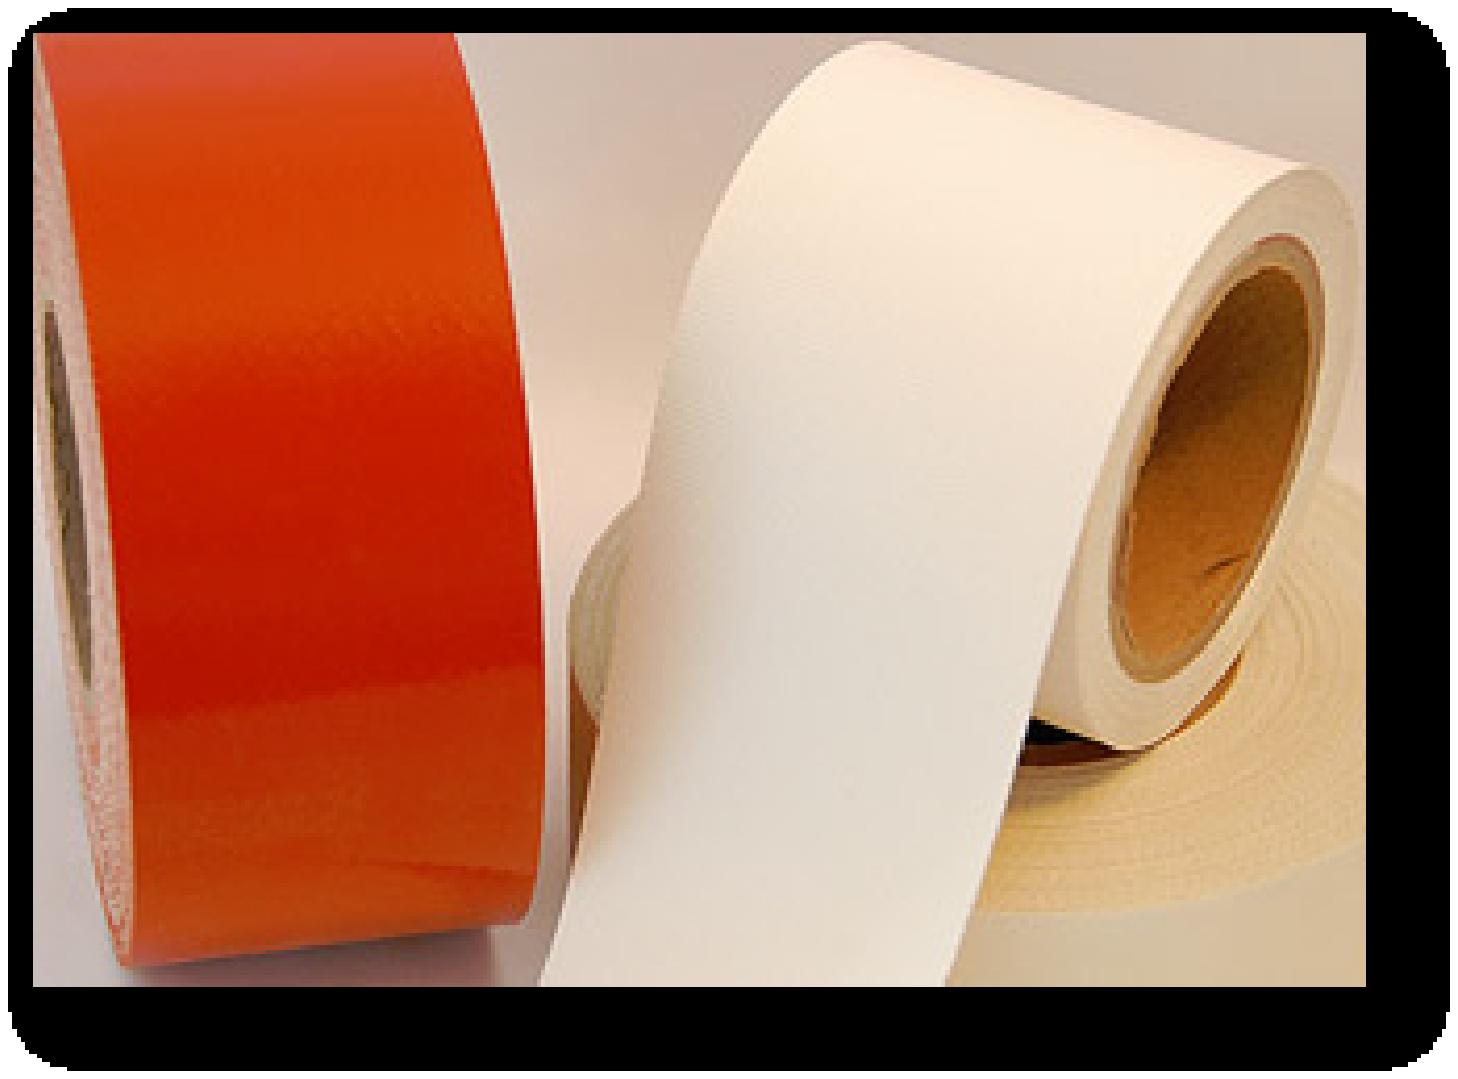 Silicone rubber coated fabrics